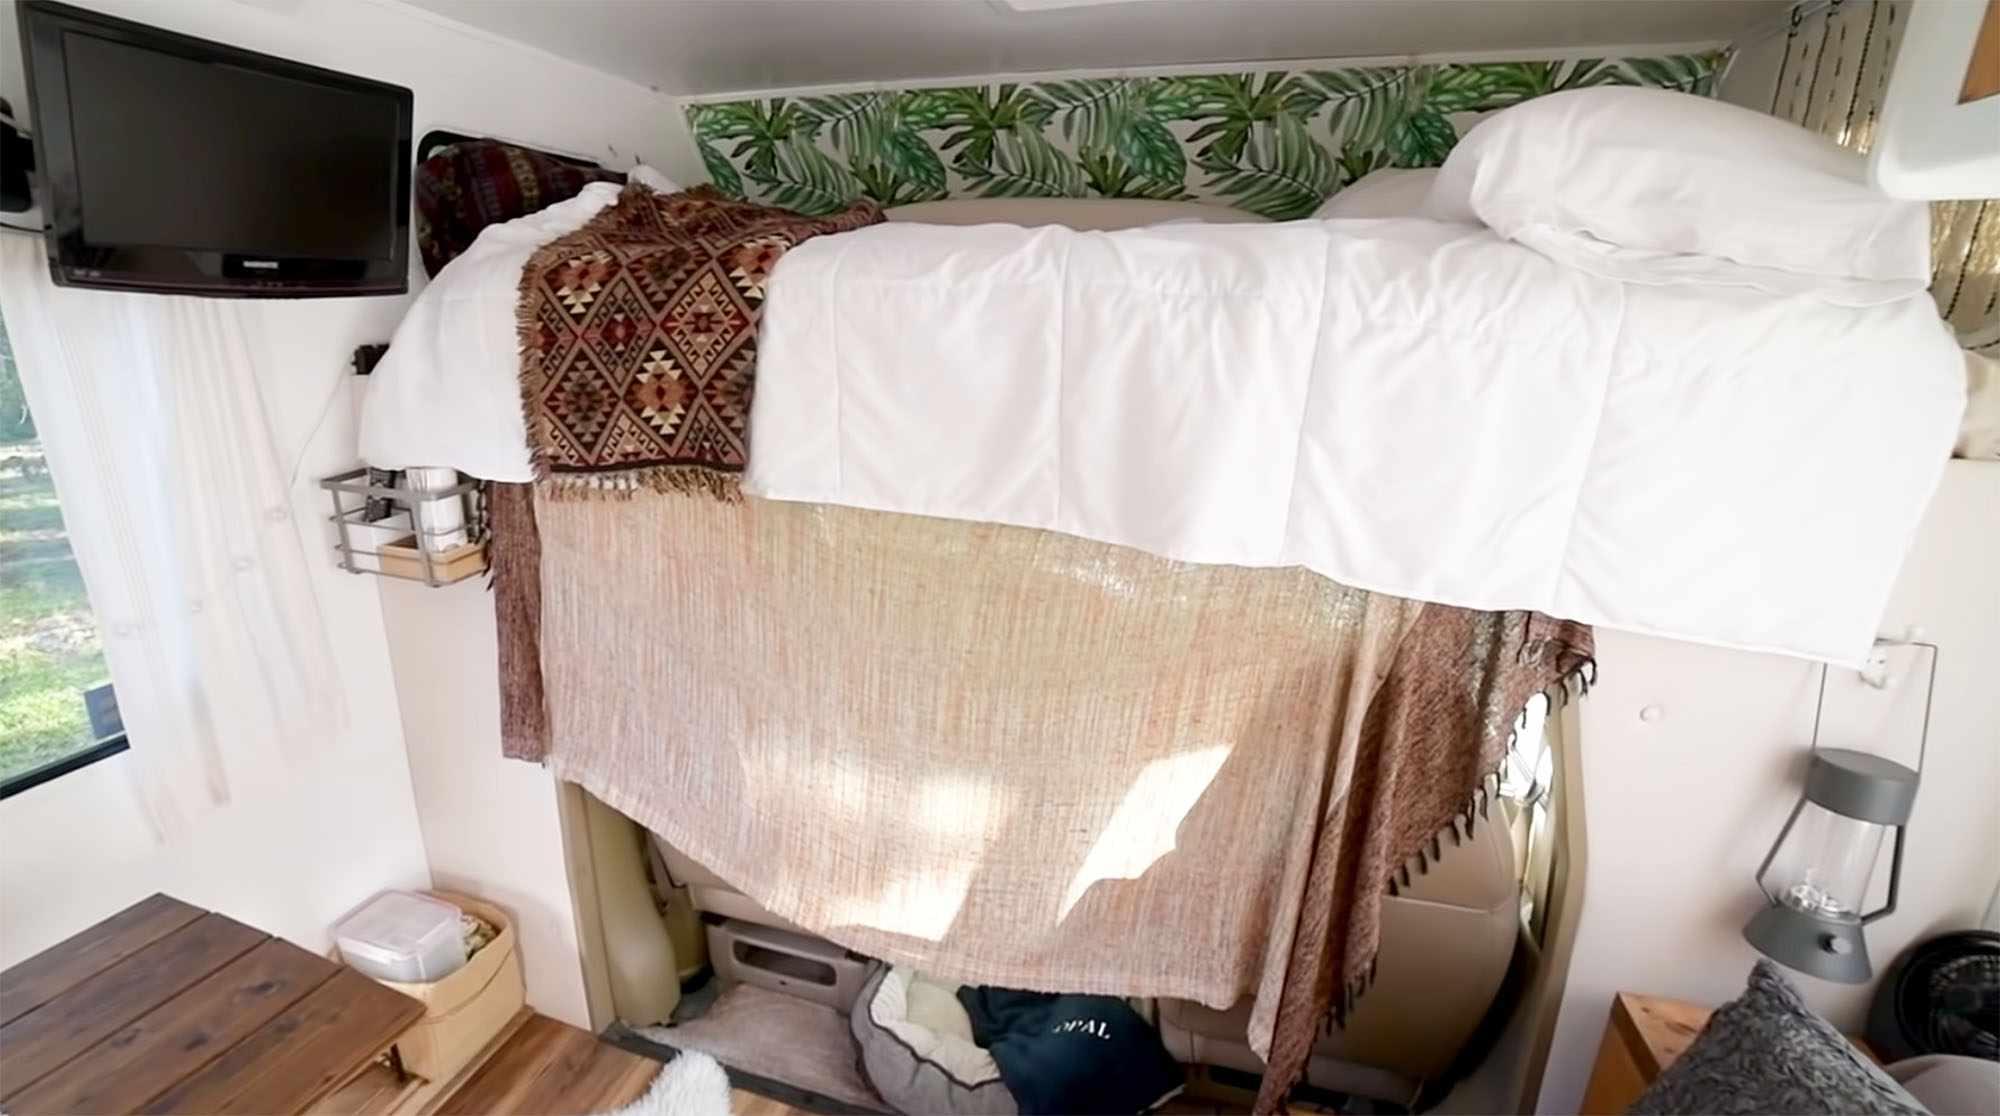 Mandy class c motorhome renovation bed